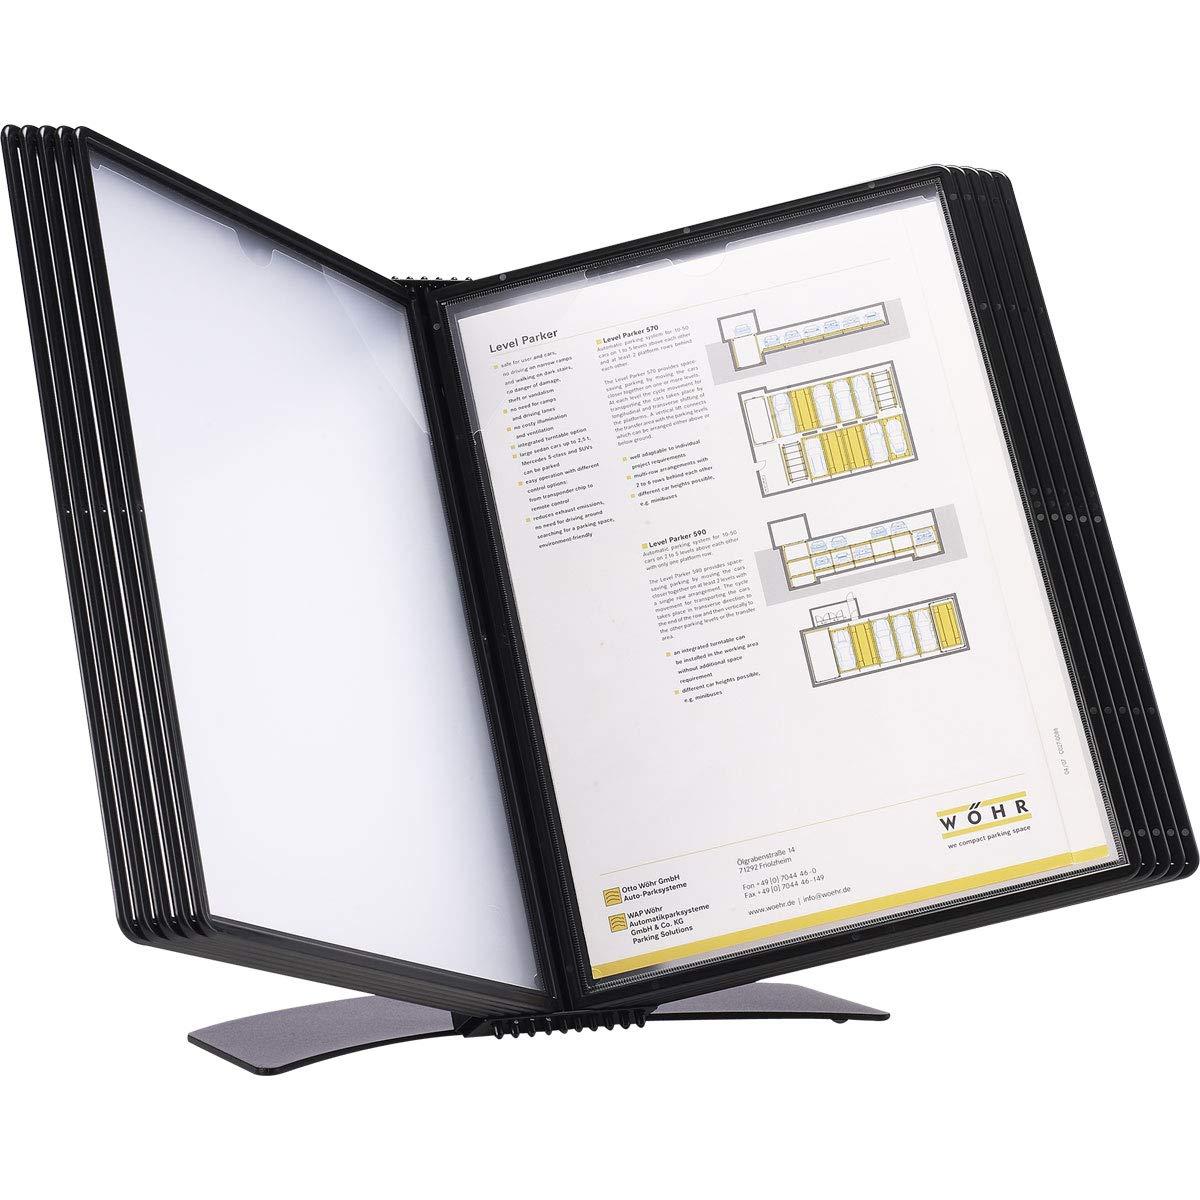 Tarifold Easy-Load Desk Display Unit with 10 Display Pockets, Black, 20 Sheet Capacity, (EZD771)